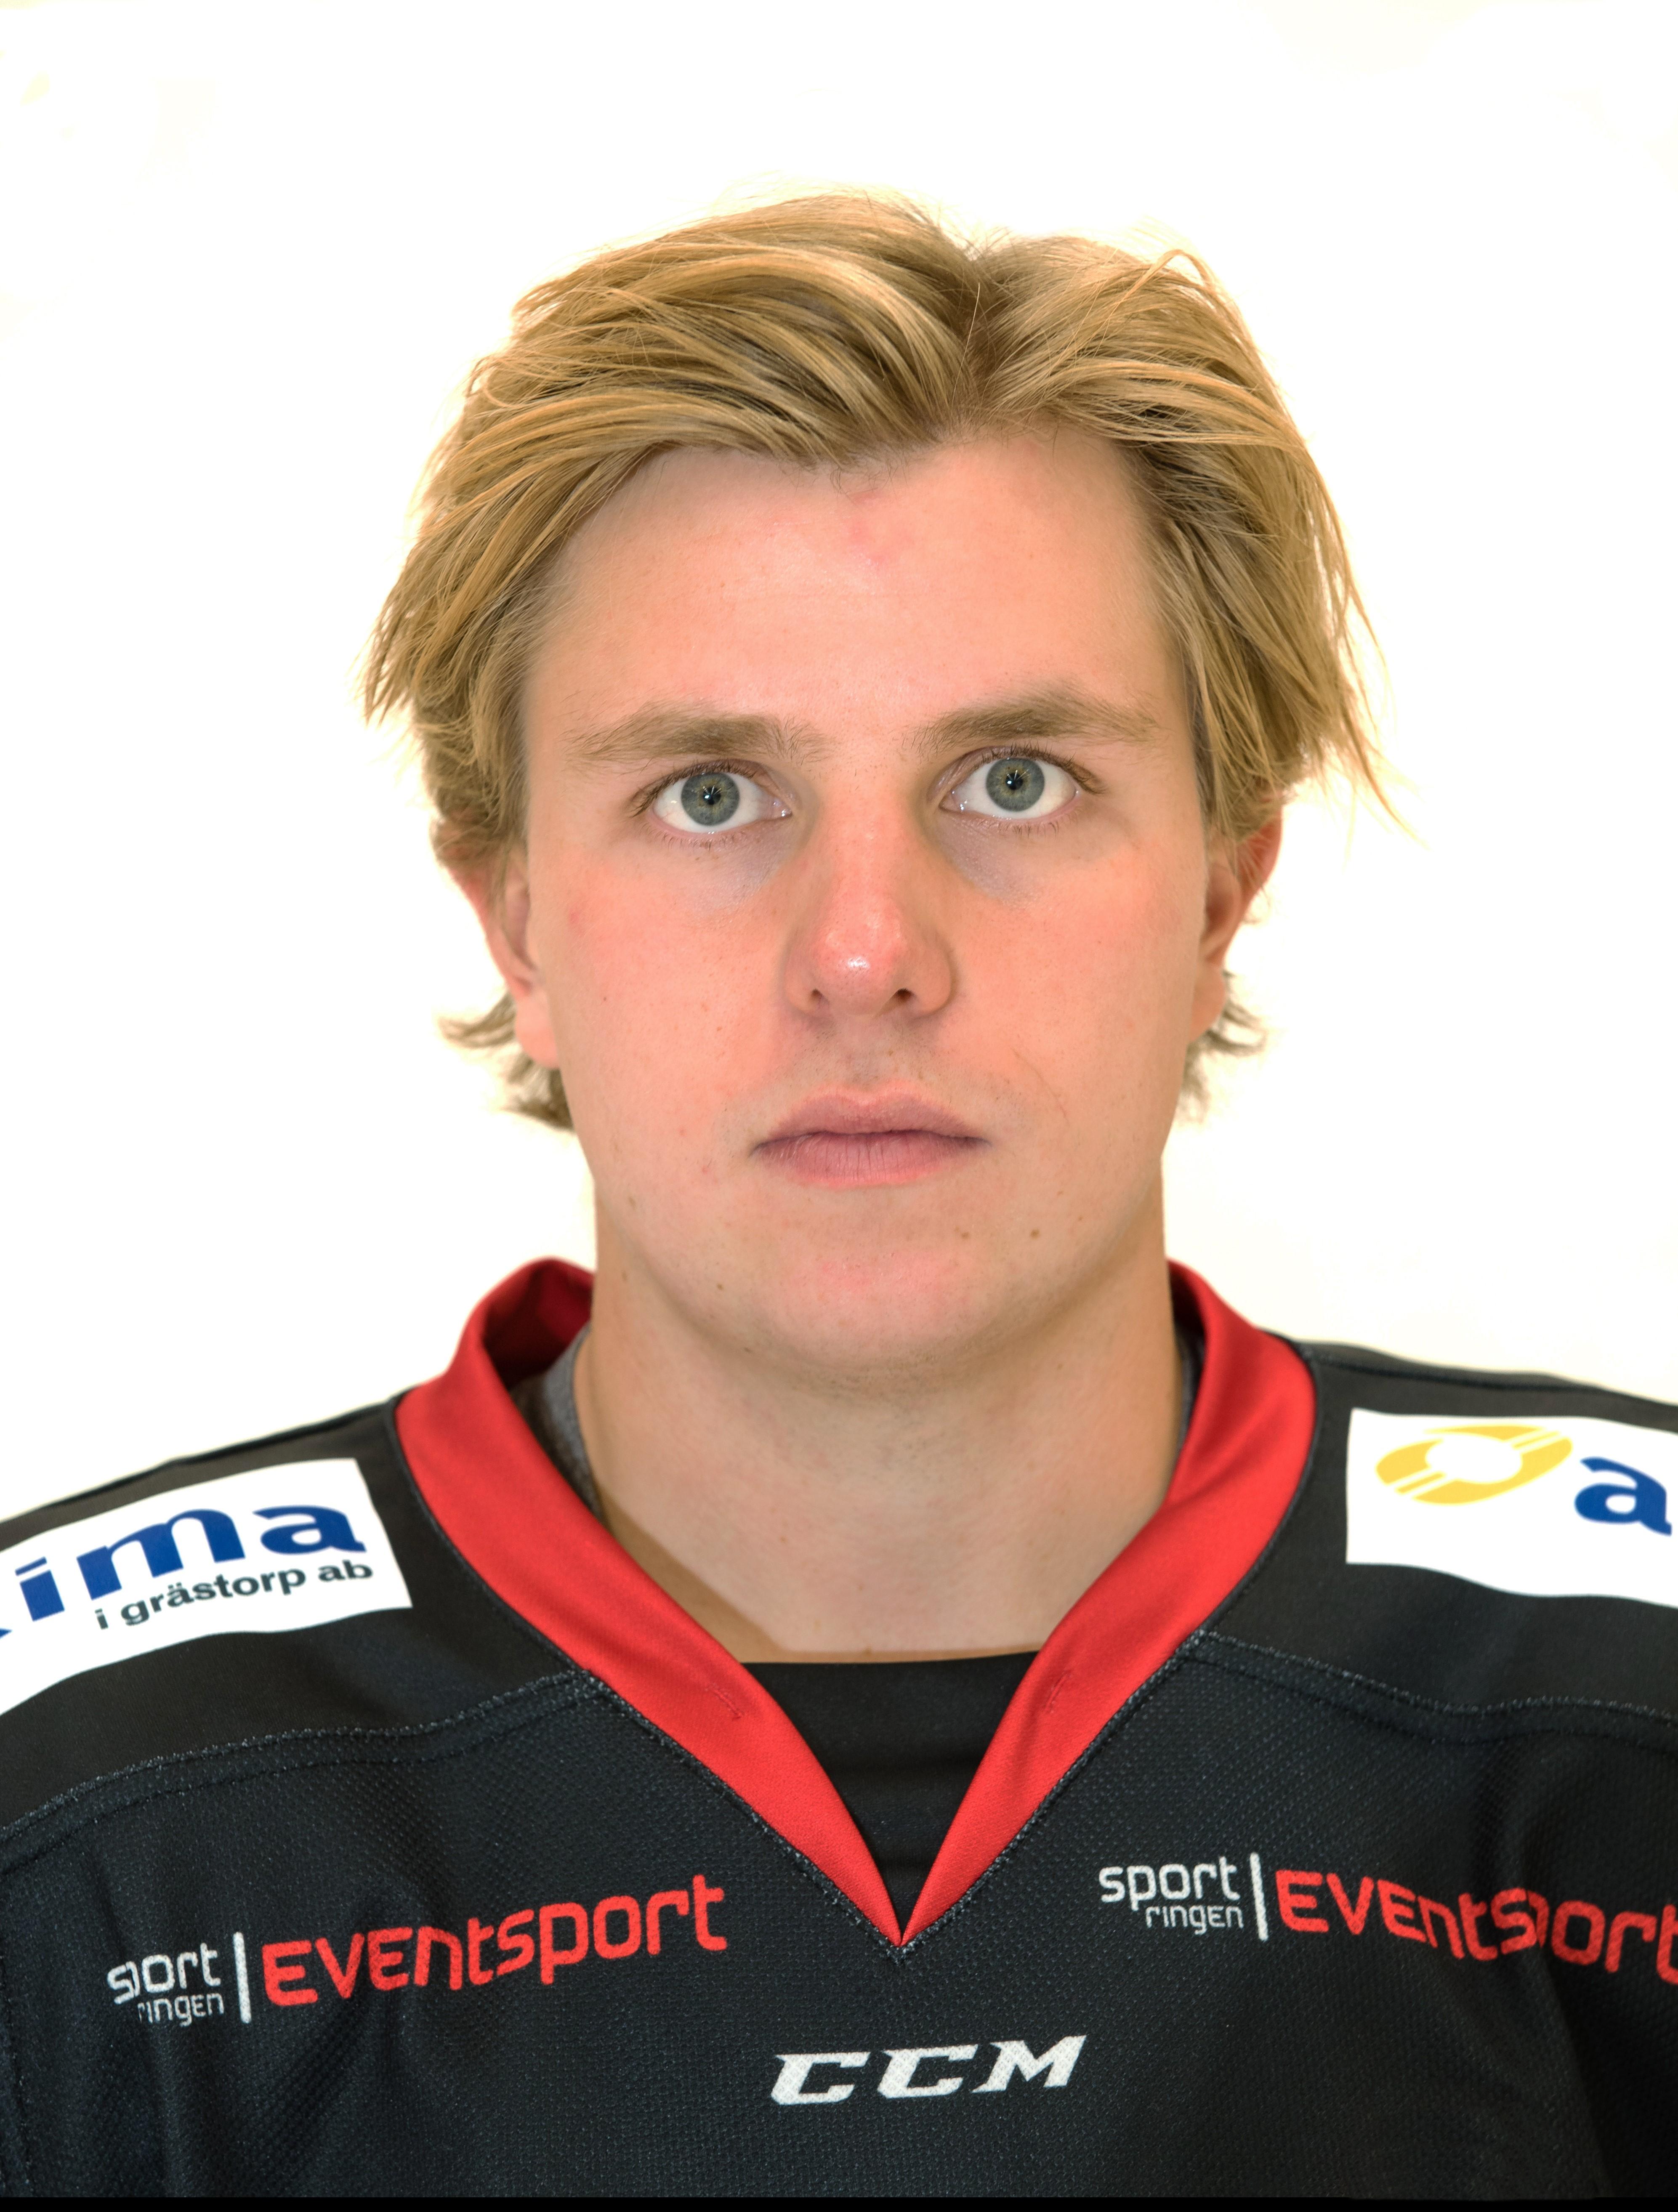 Henrik Ekeståhl